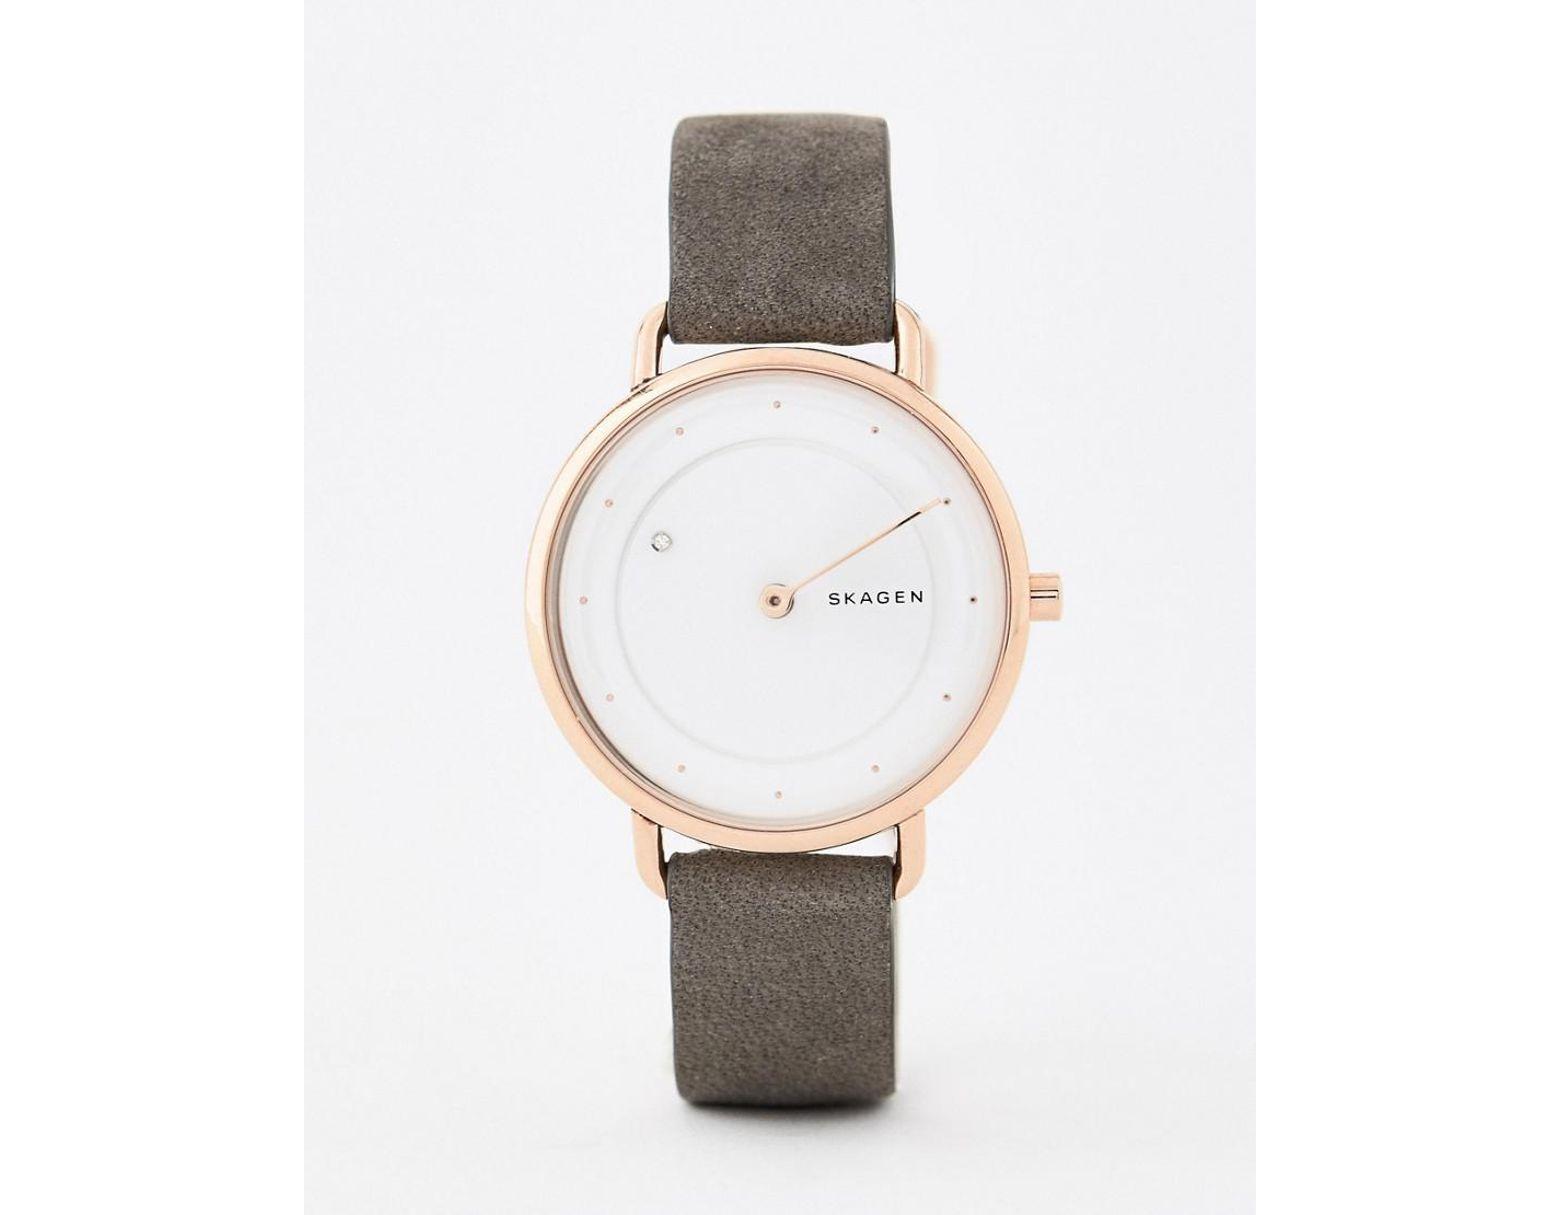 276530e4800 Skagen Skw2739 Horisont Leather Watch 36mm in Gray for Men - Lyst